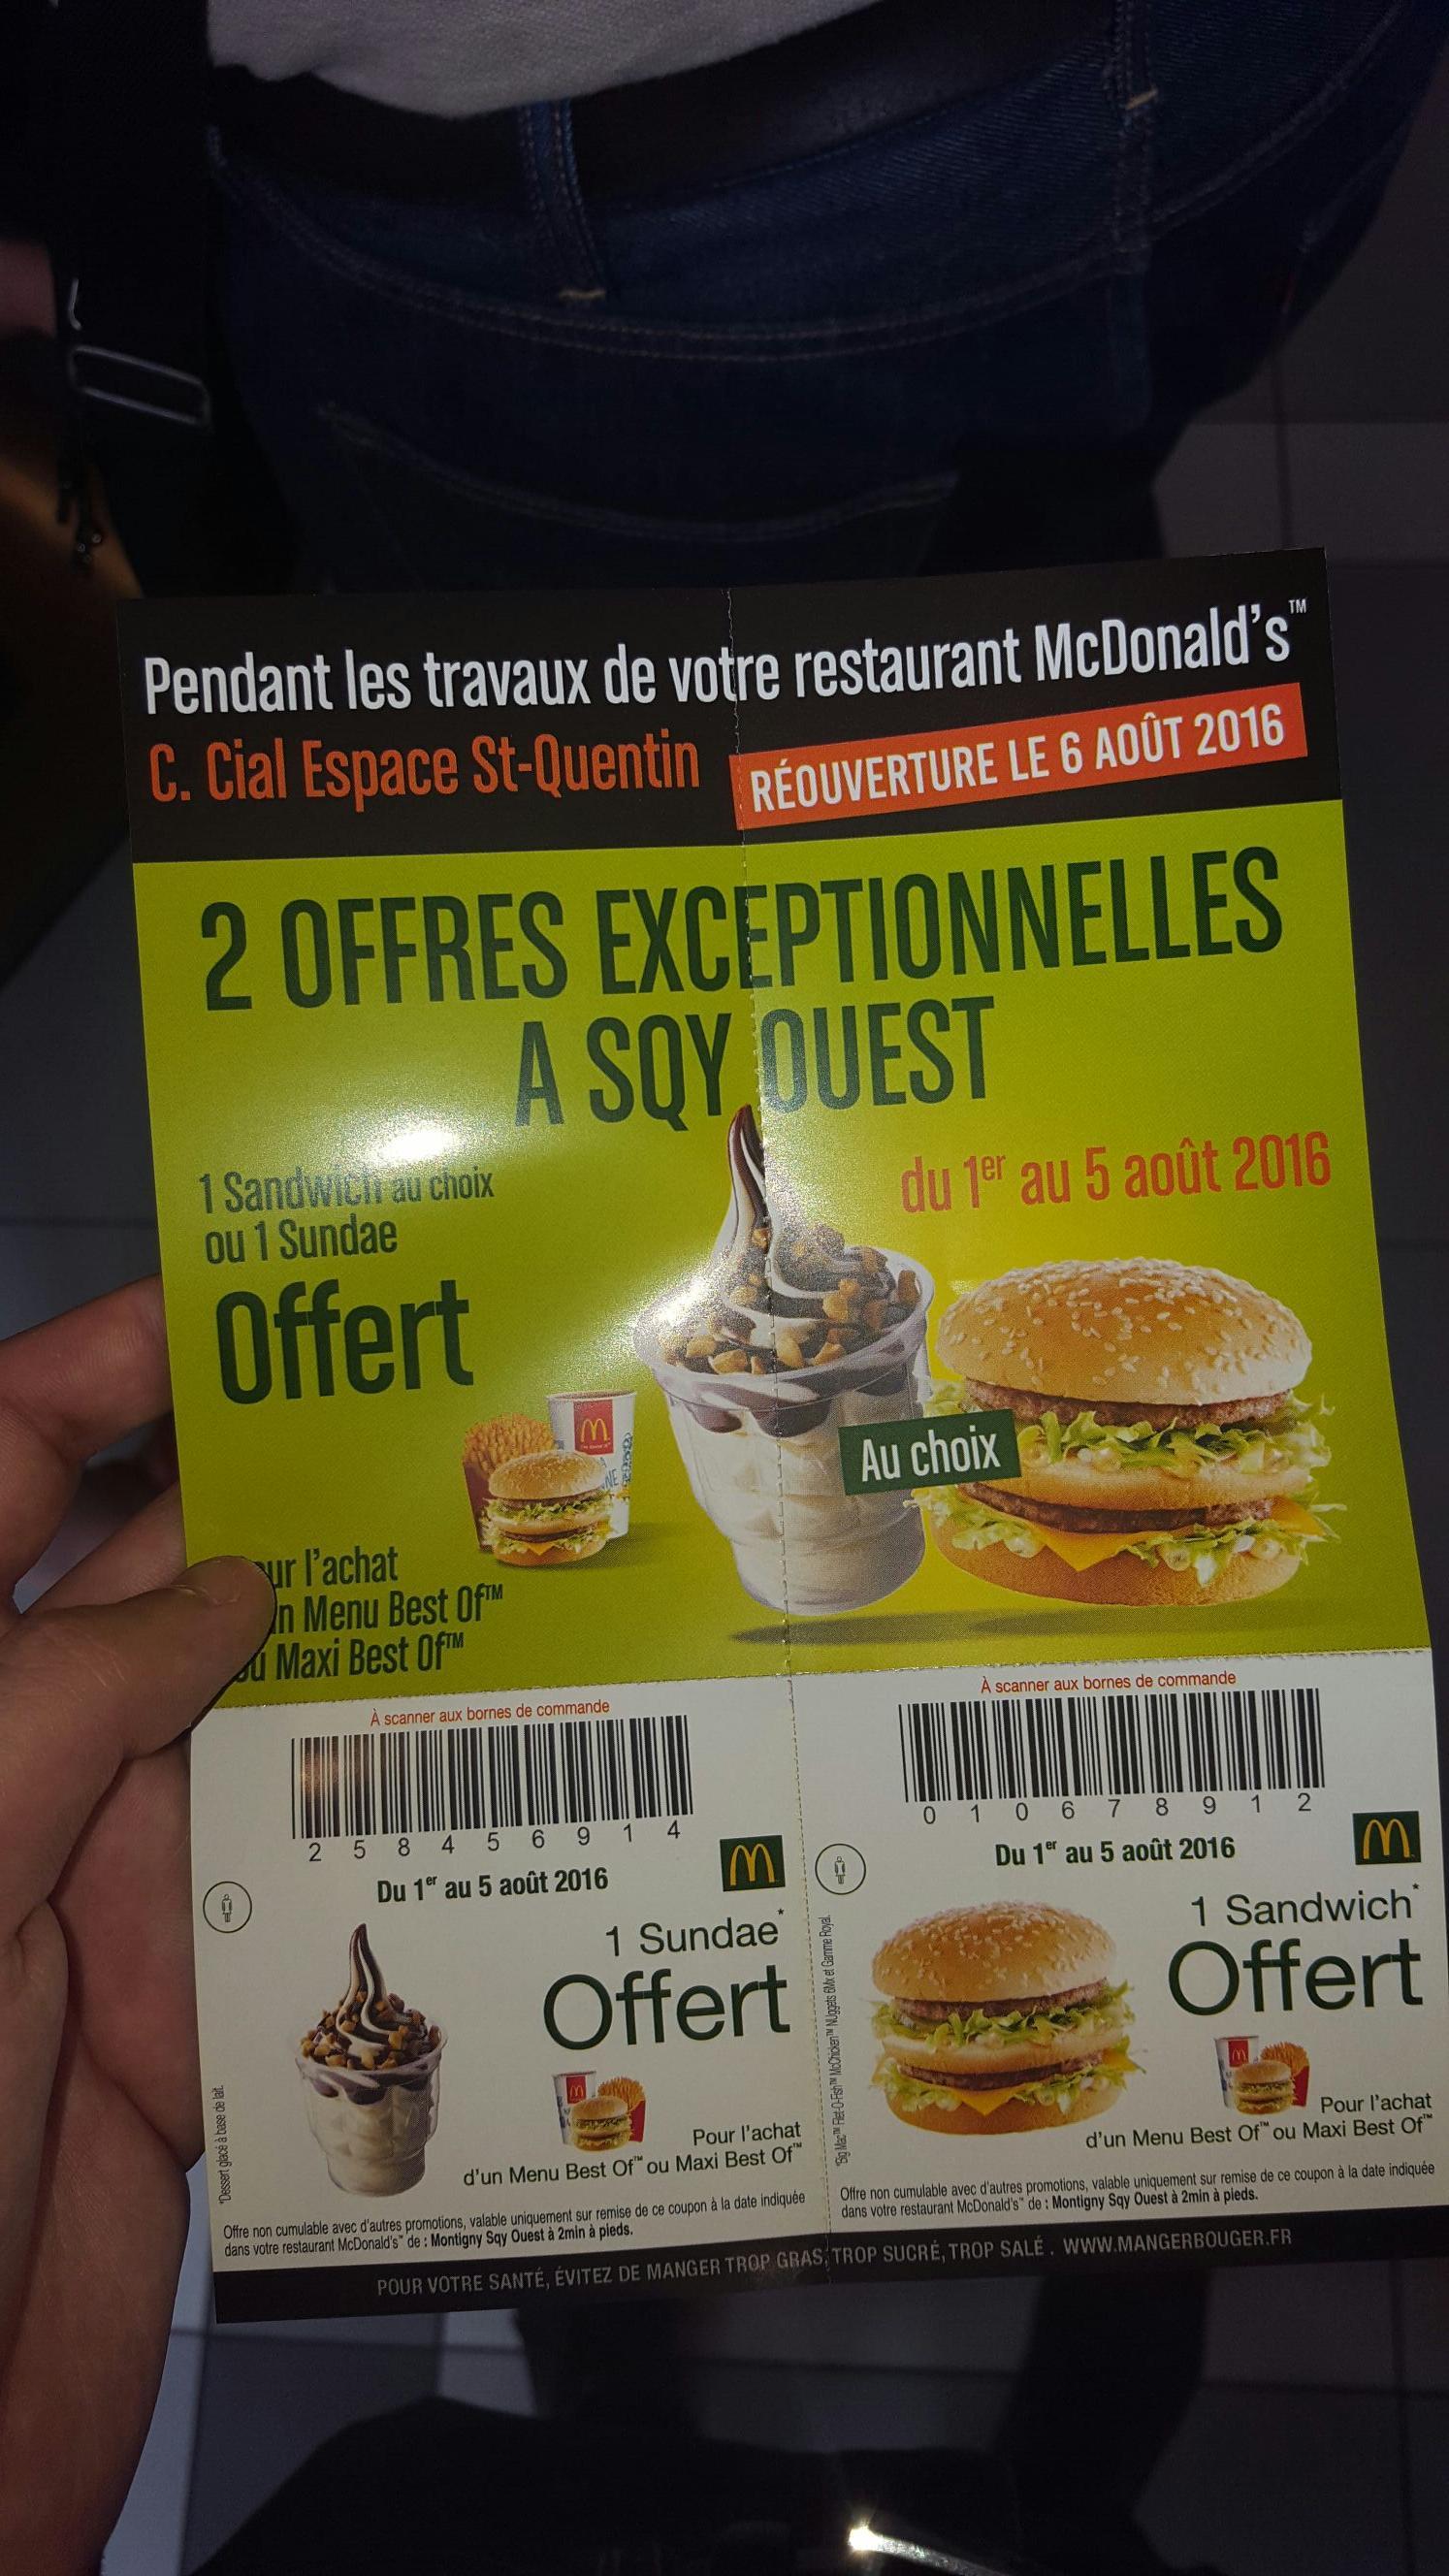 1 Menu Best of acheté = 1 Sundae ou 1 Big mac offert